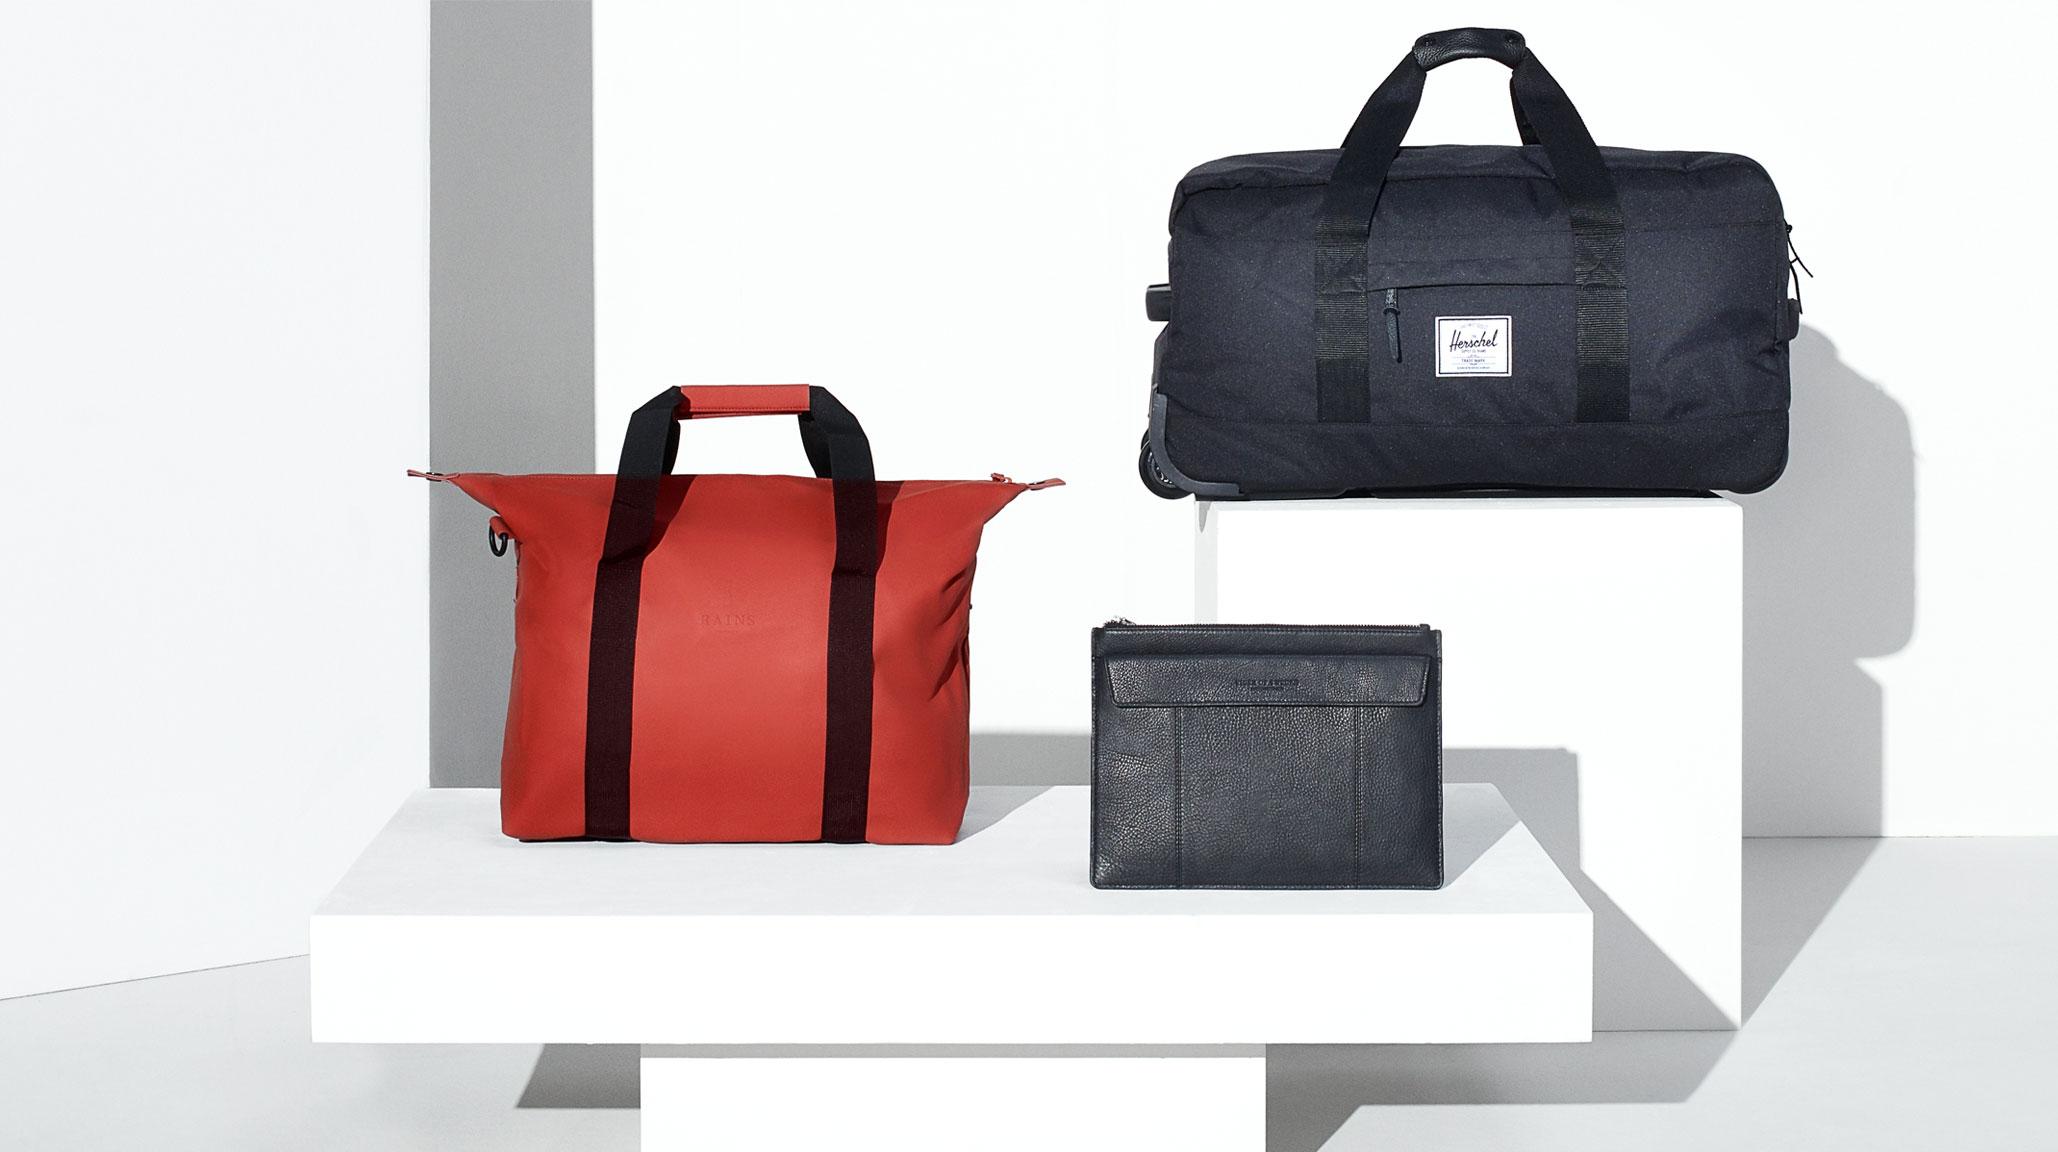 Reisegepäck für die Frau